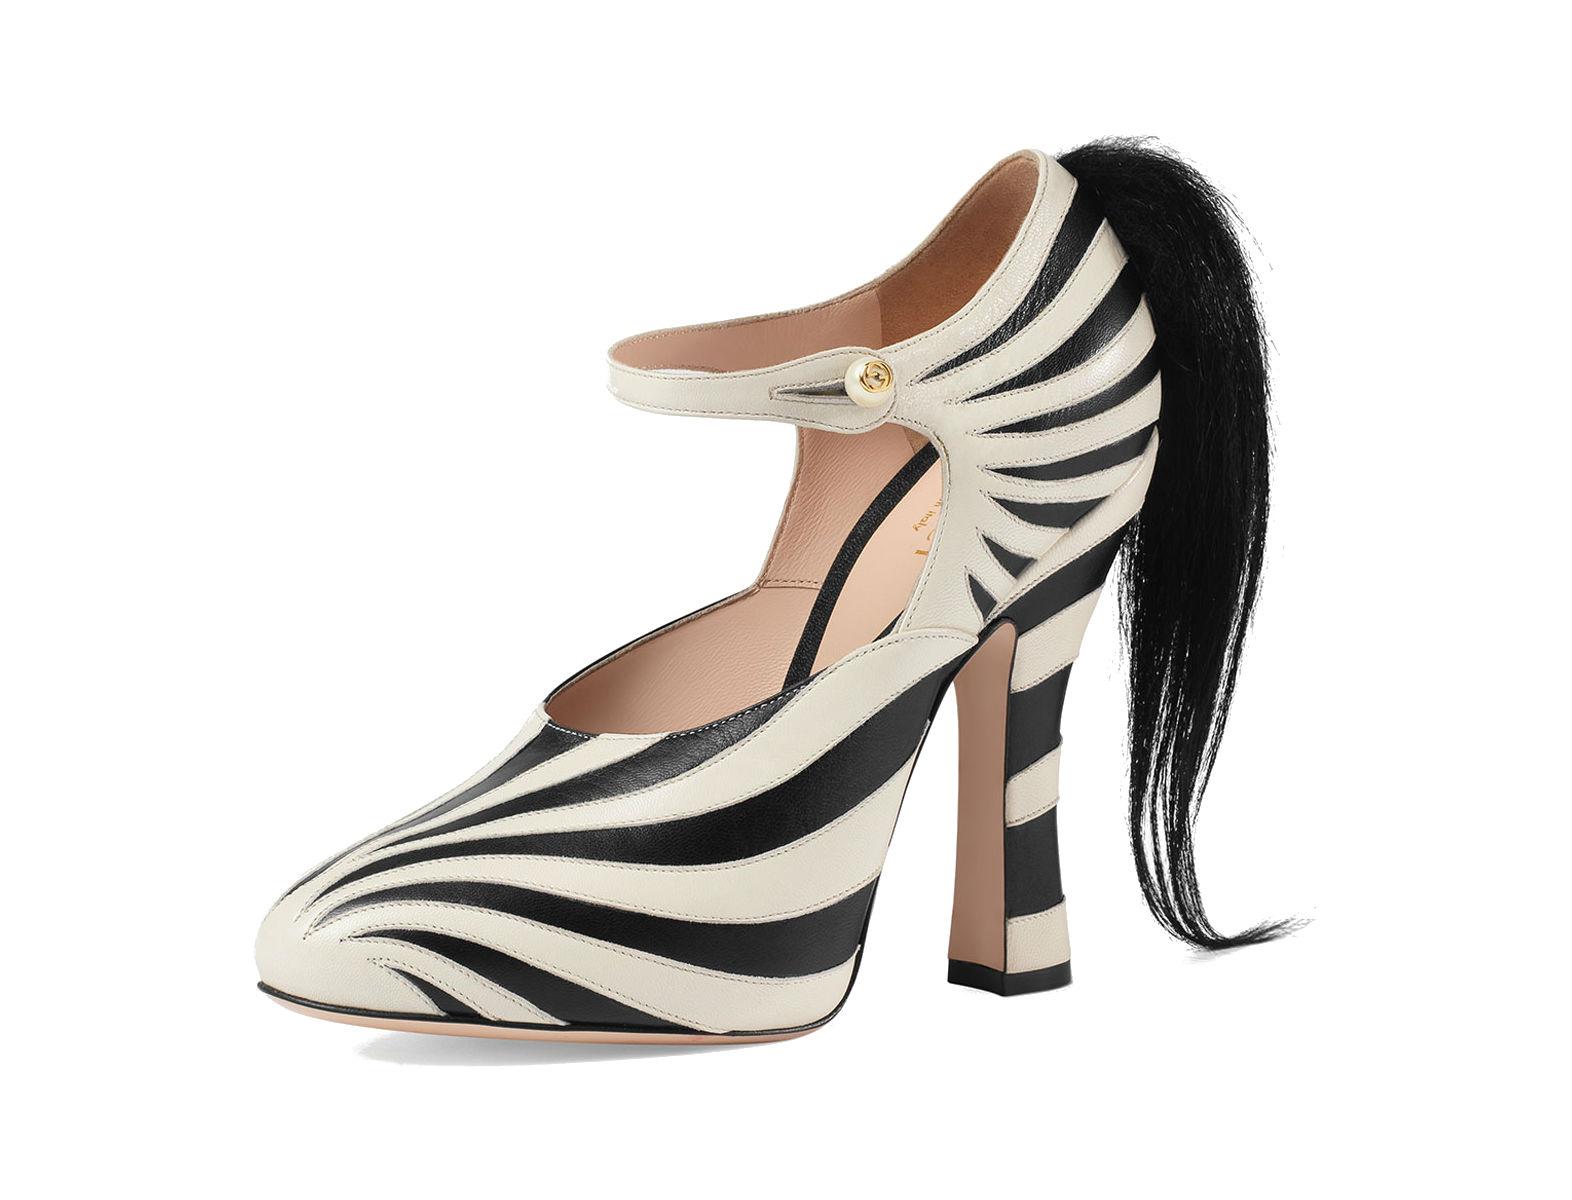 Lesley Zebra-Print Mary Jane Pumps